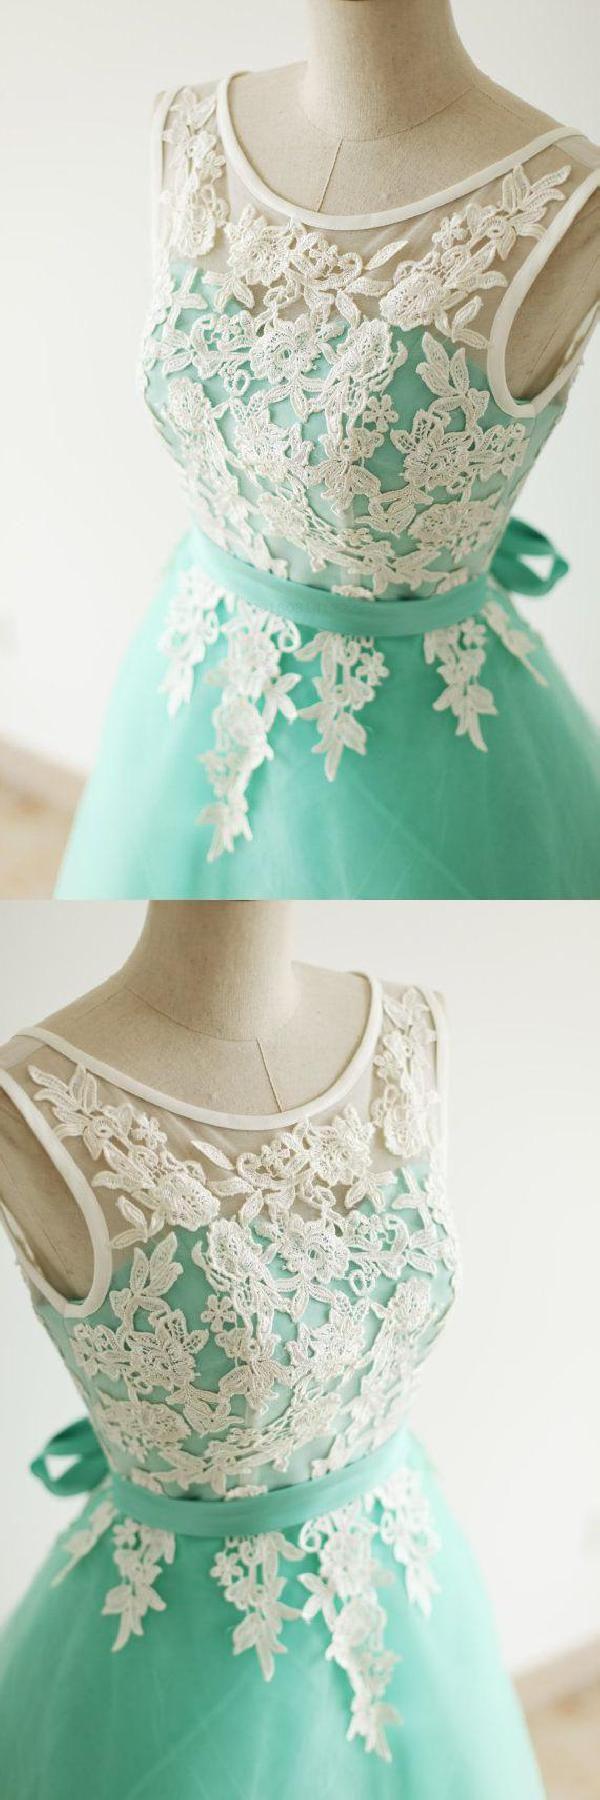 Lace prom dresses lacepromdresses prom dresses short